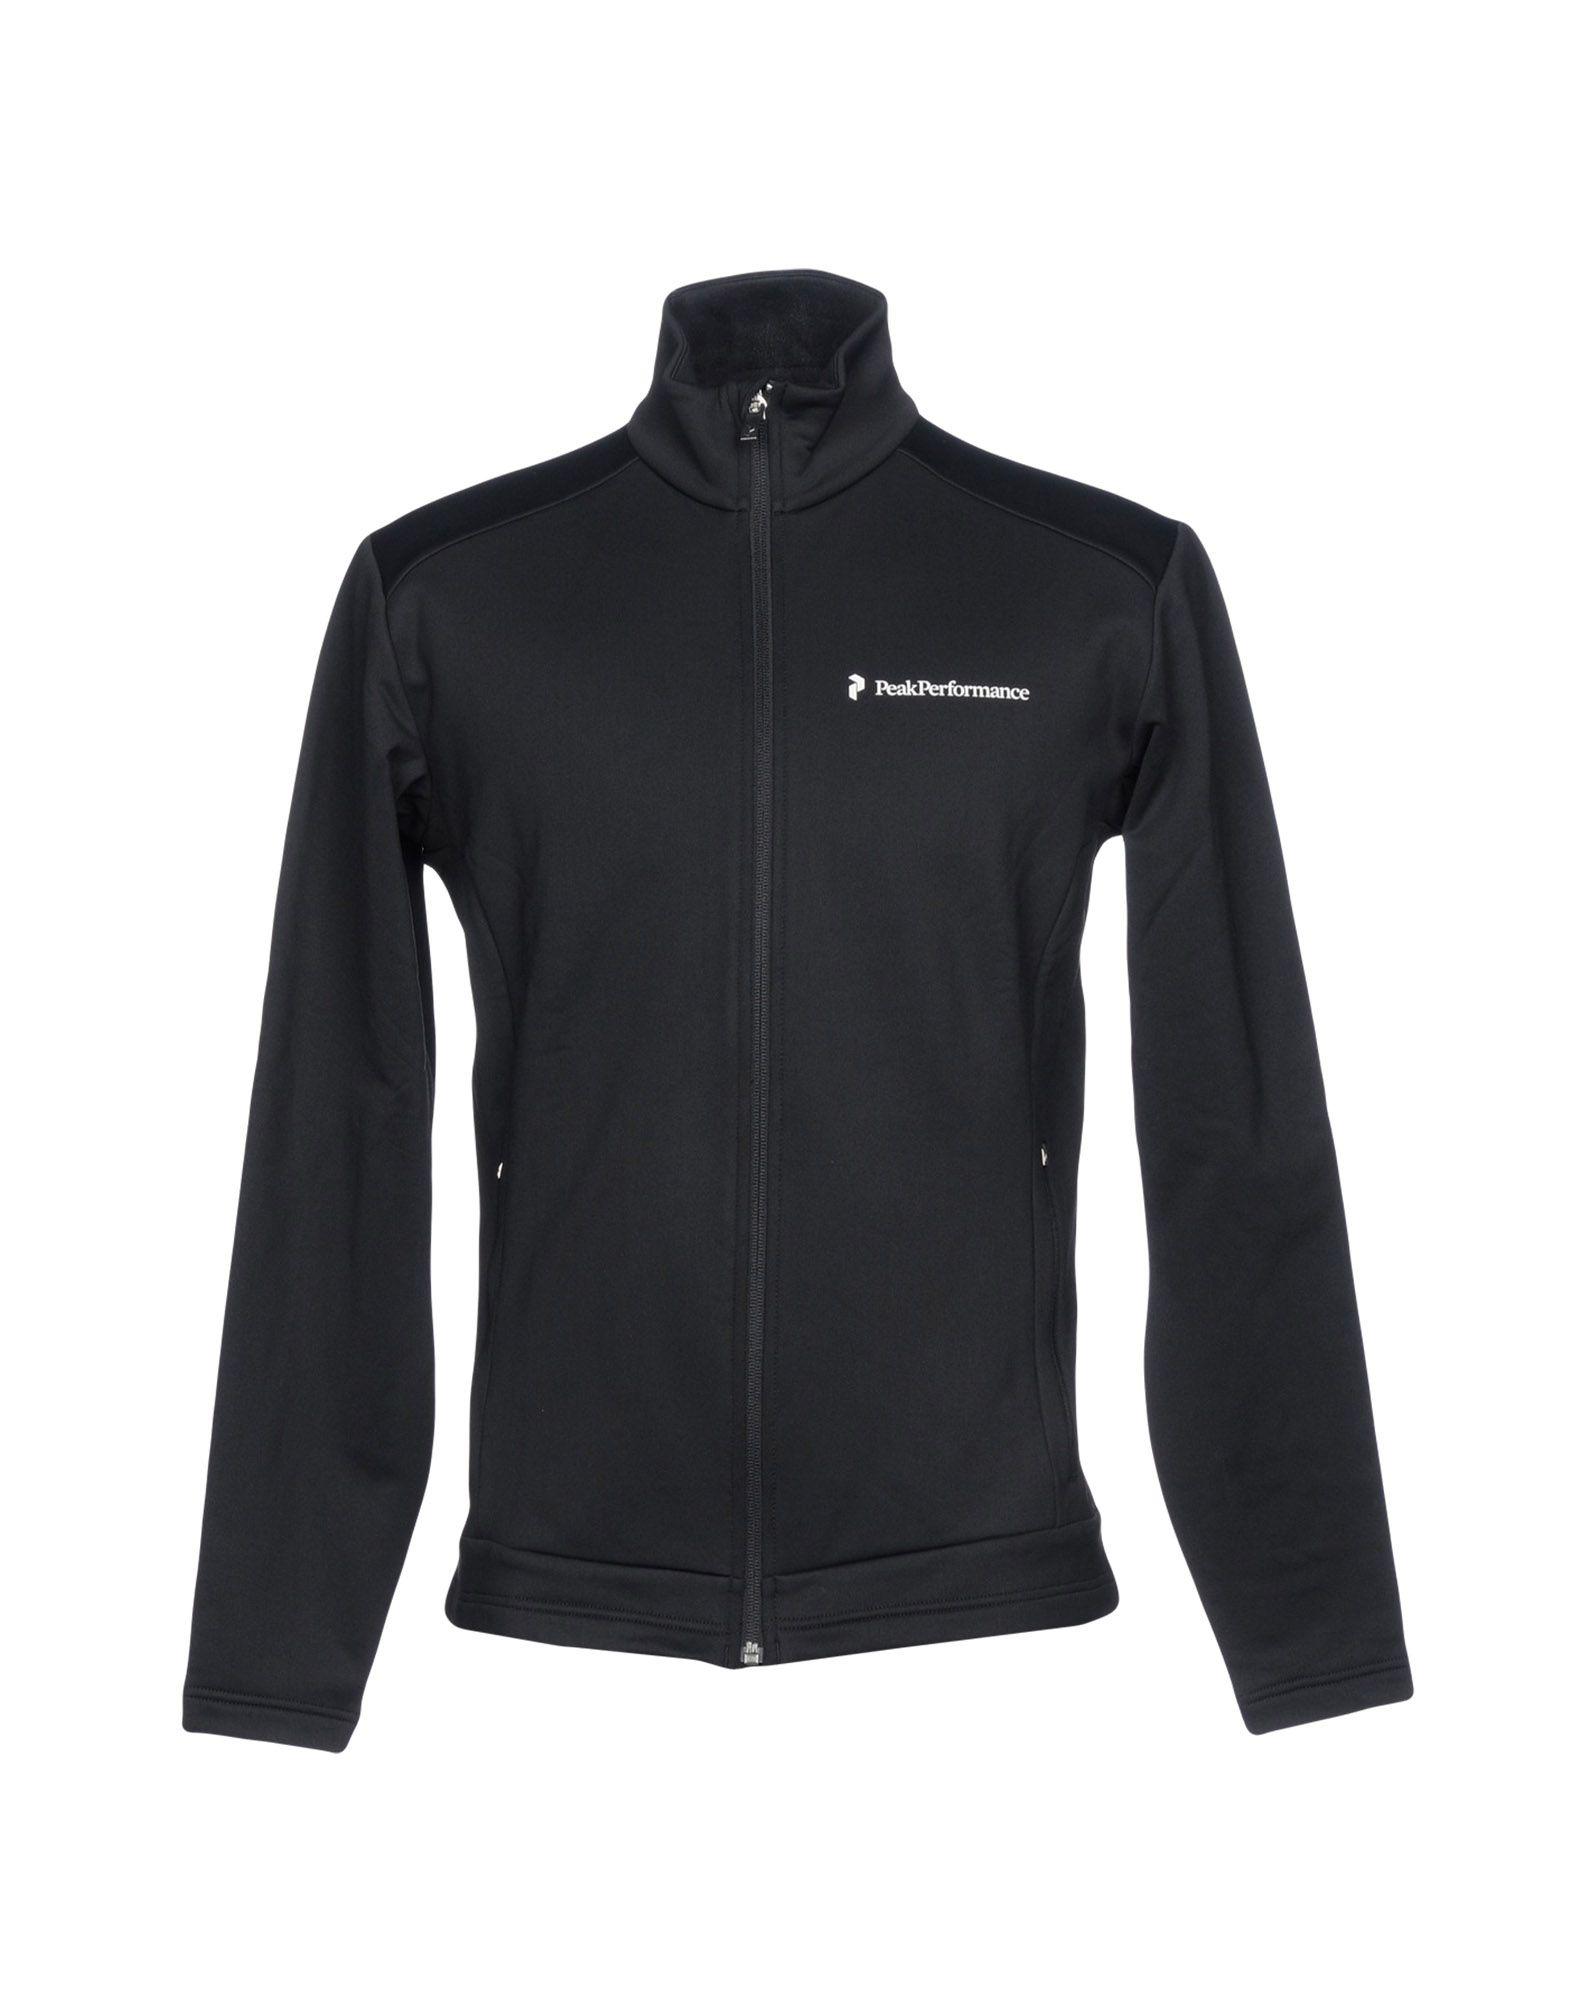 PEAK PERFORMANCE Толстовка толстовка peak performance peak performance lite zipper hood